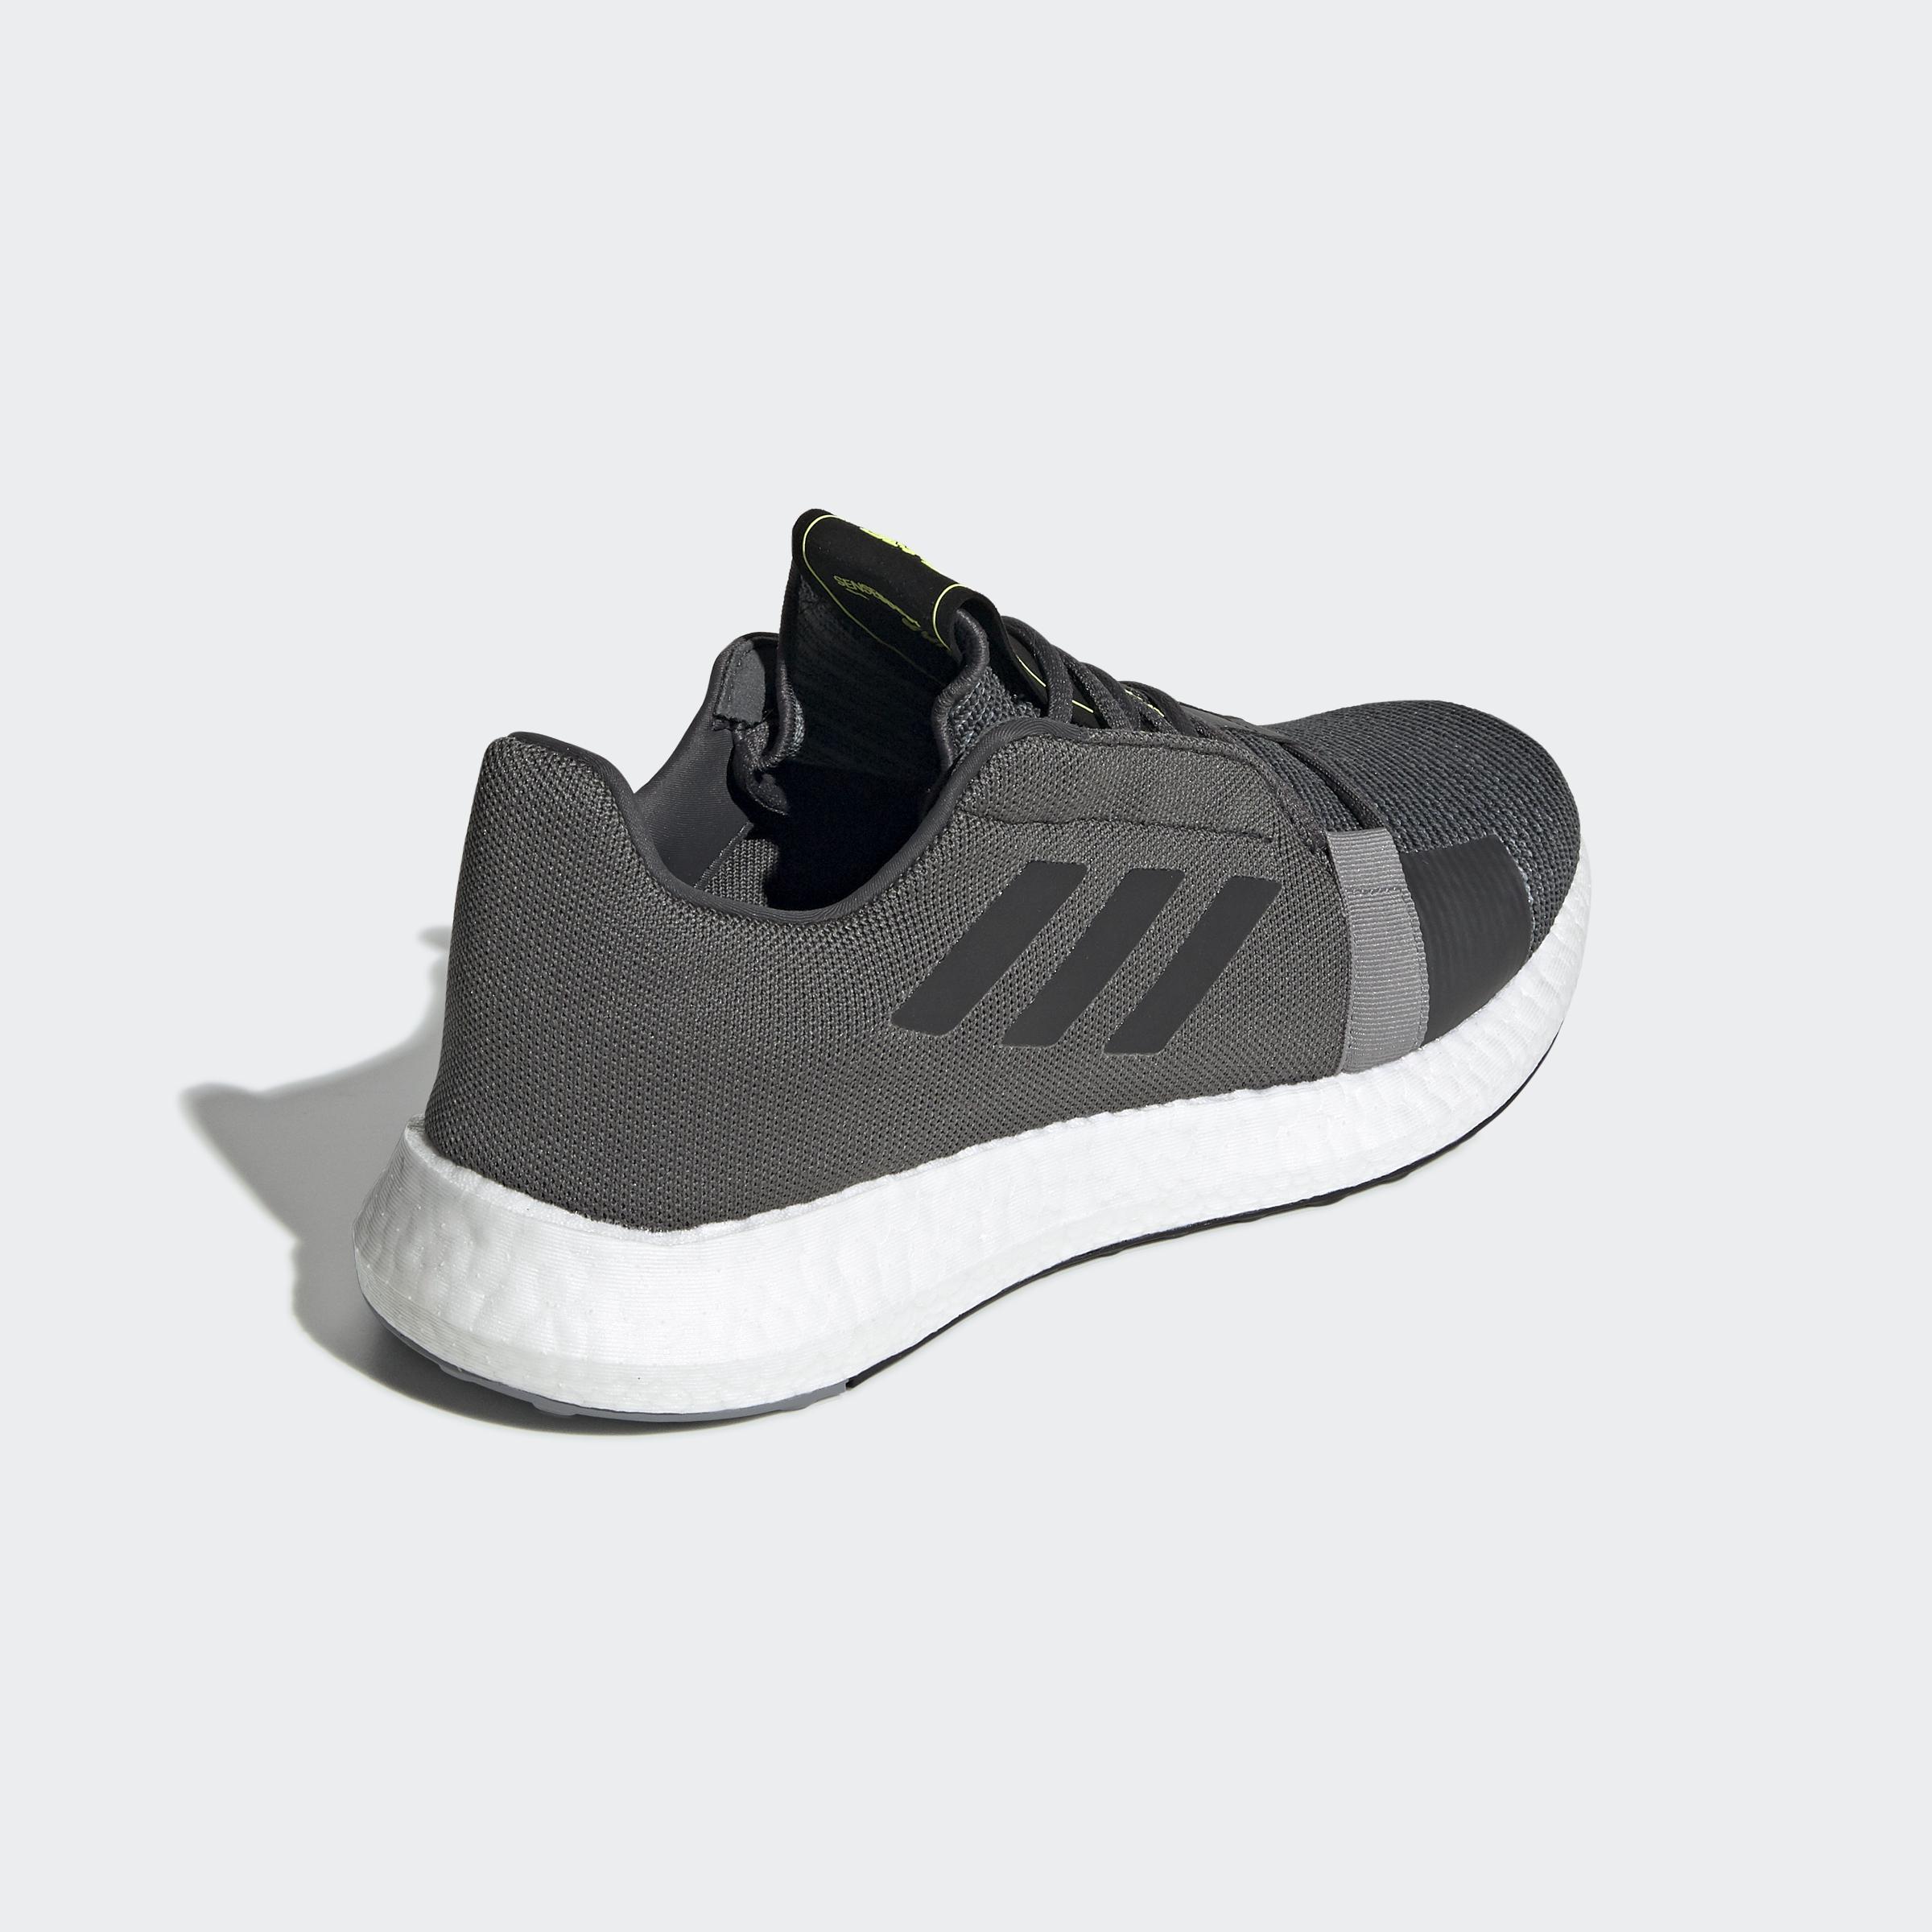 miniature 17 - adidas Senseboost Go Shoes Men's Athletic & Sneakers